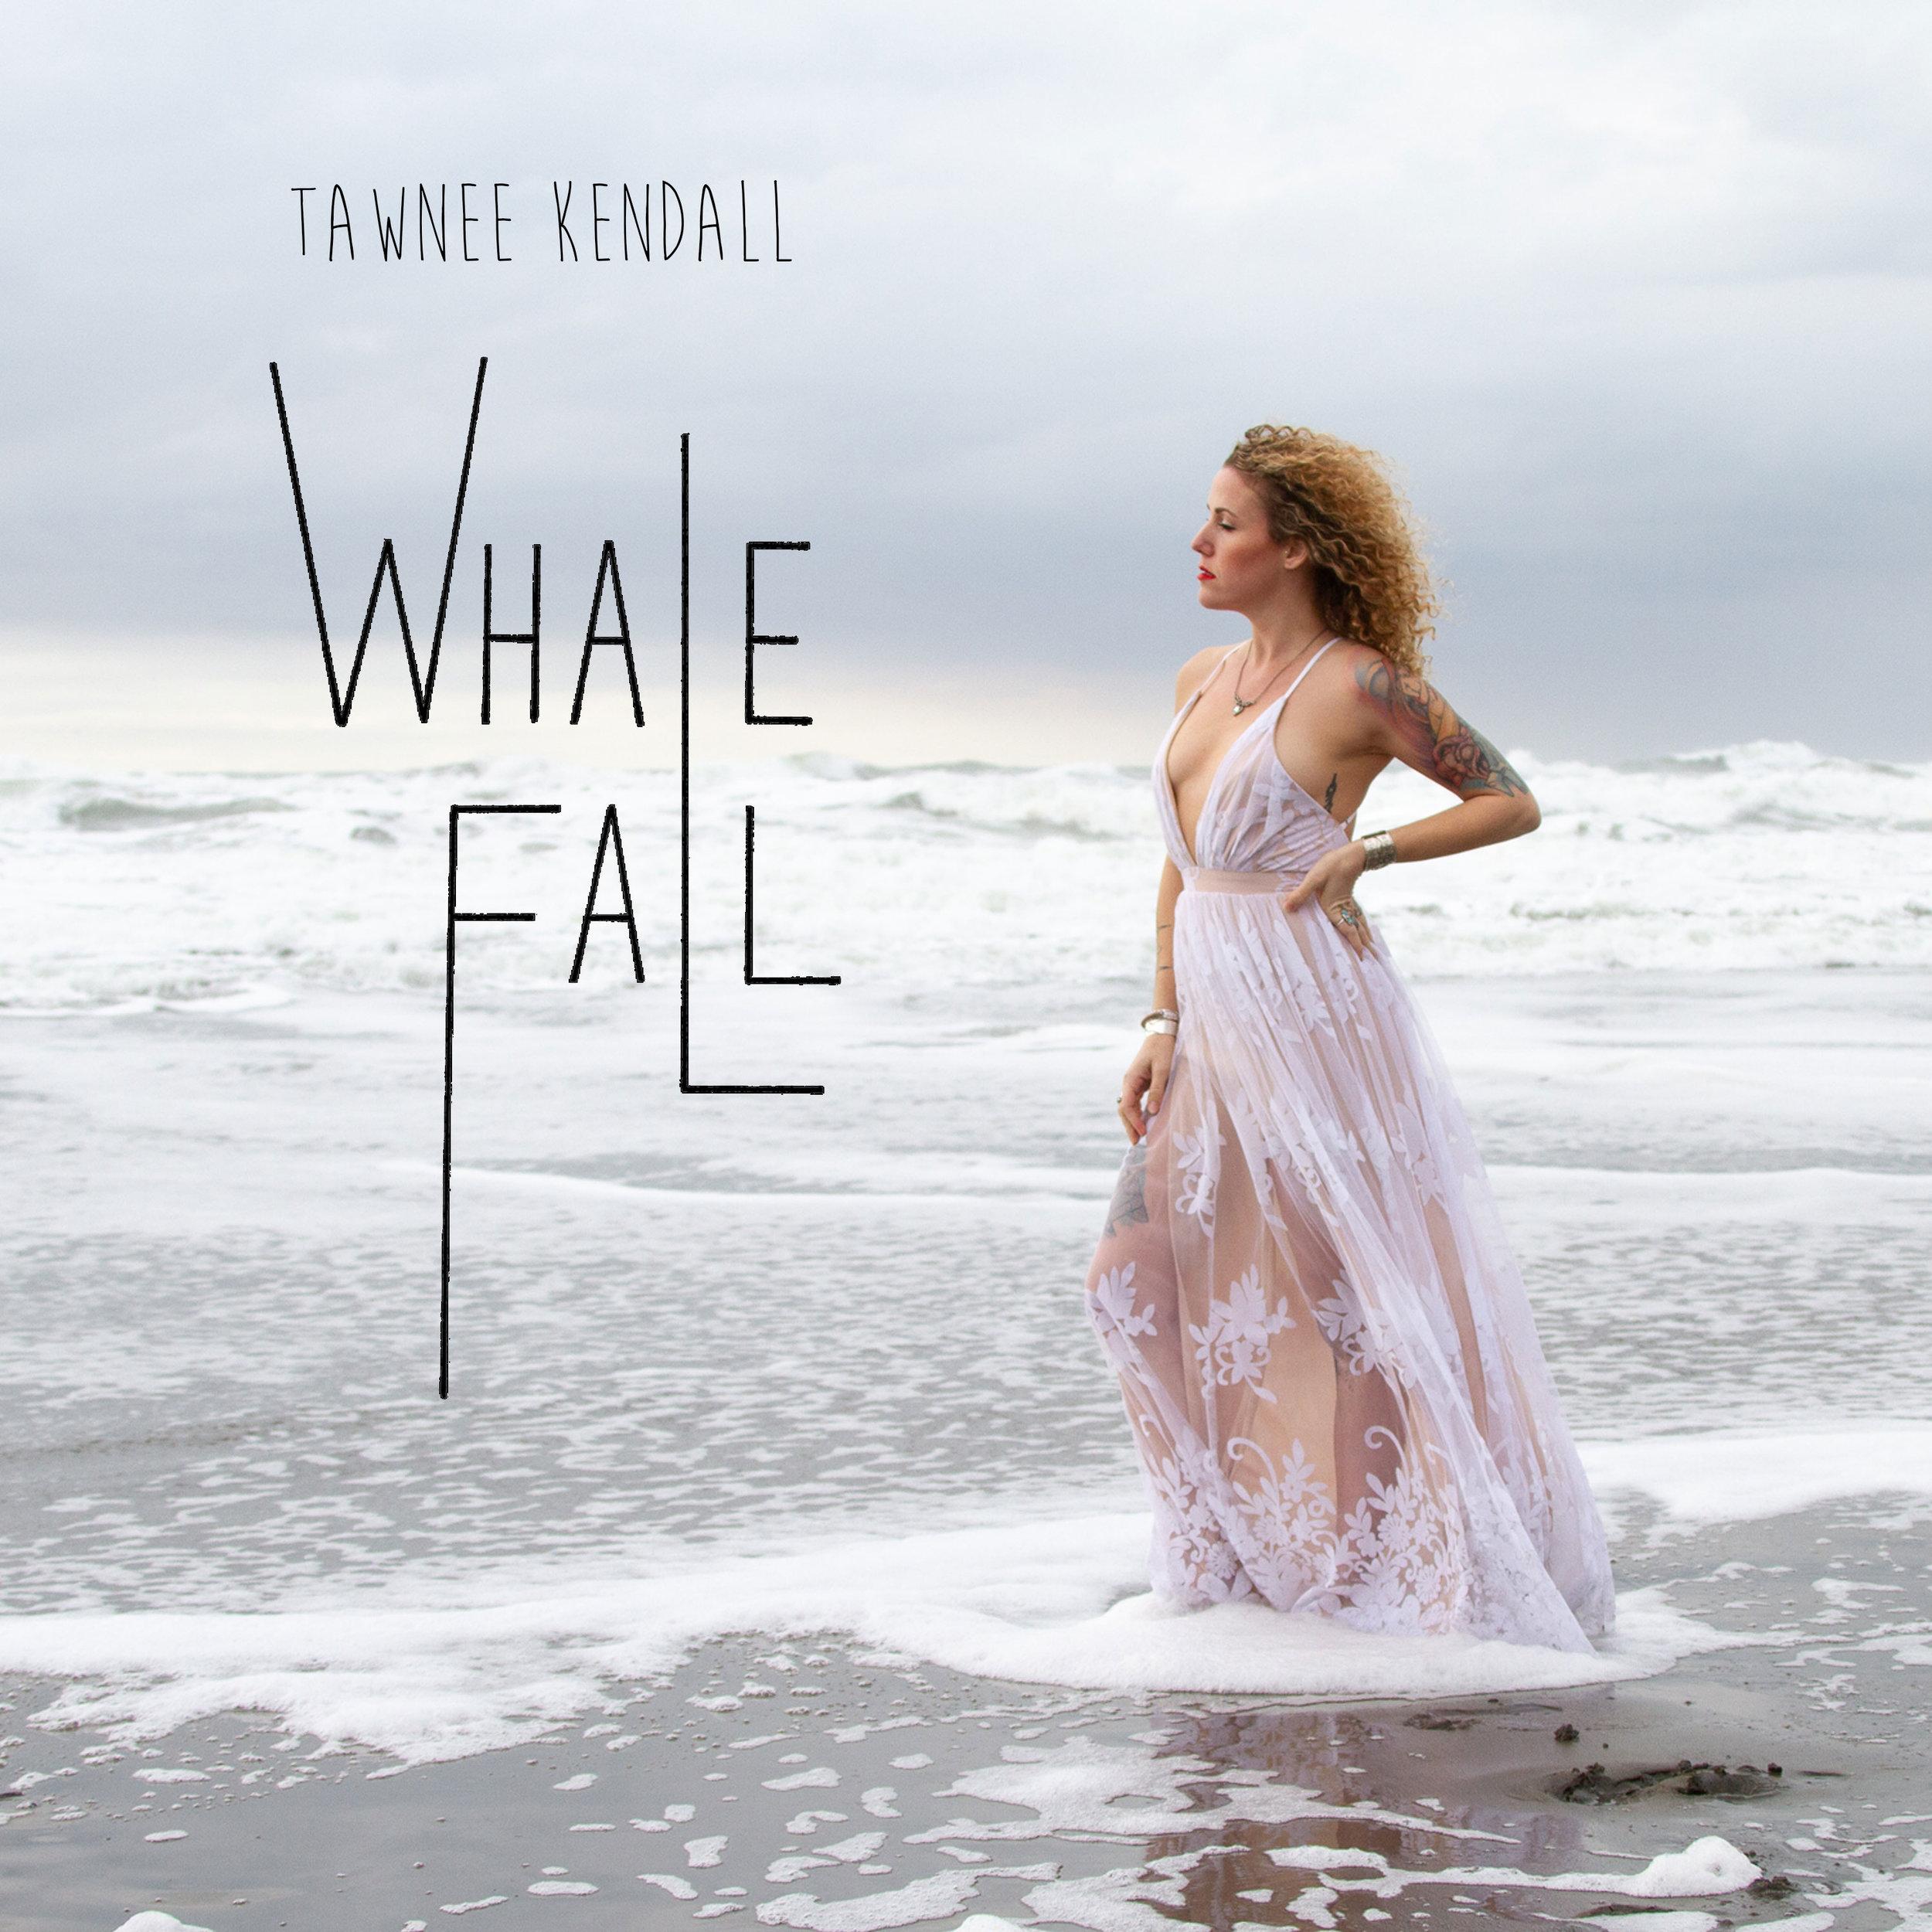 WhaleFall-FINAL-front.jpg